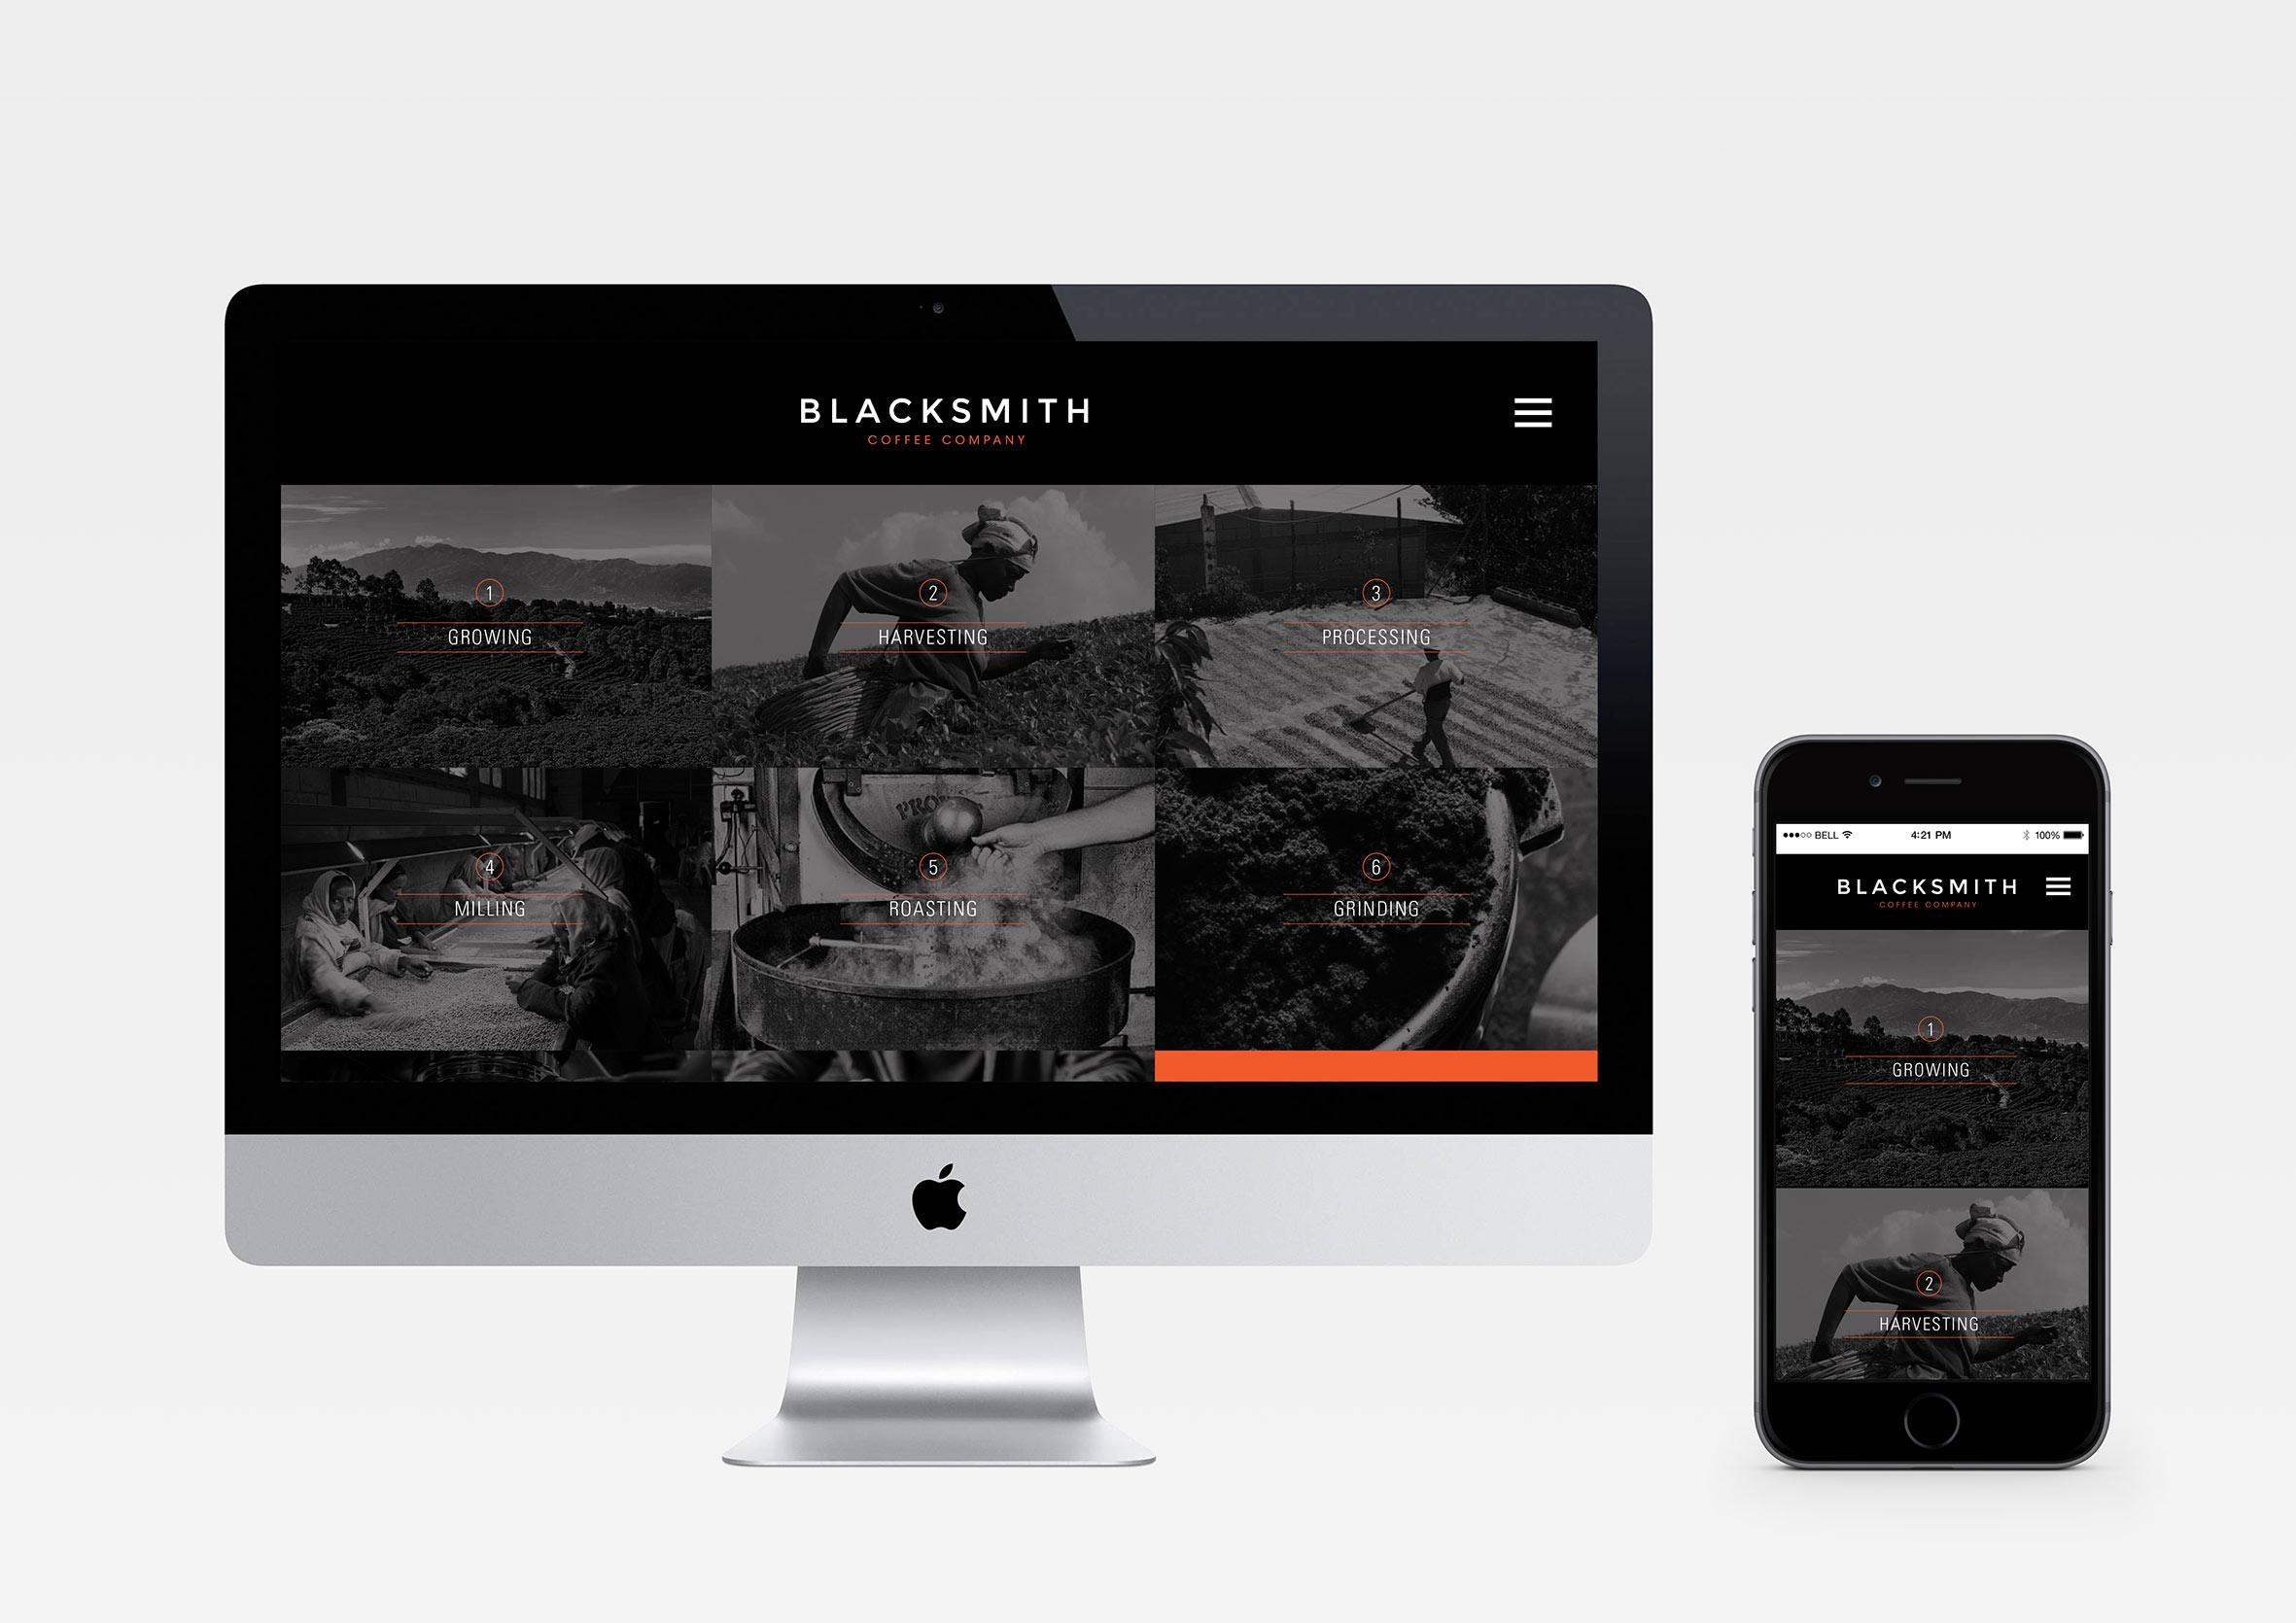 Blacksmith-identite-branding-website-digital.jpg